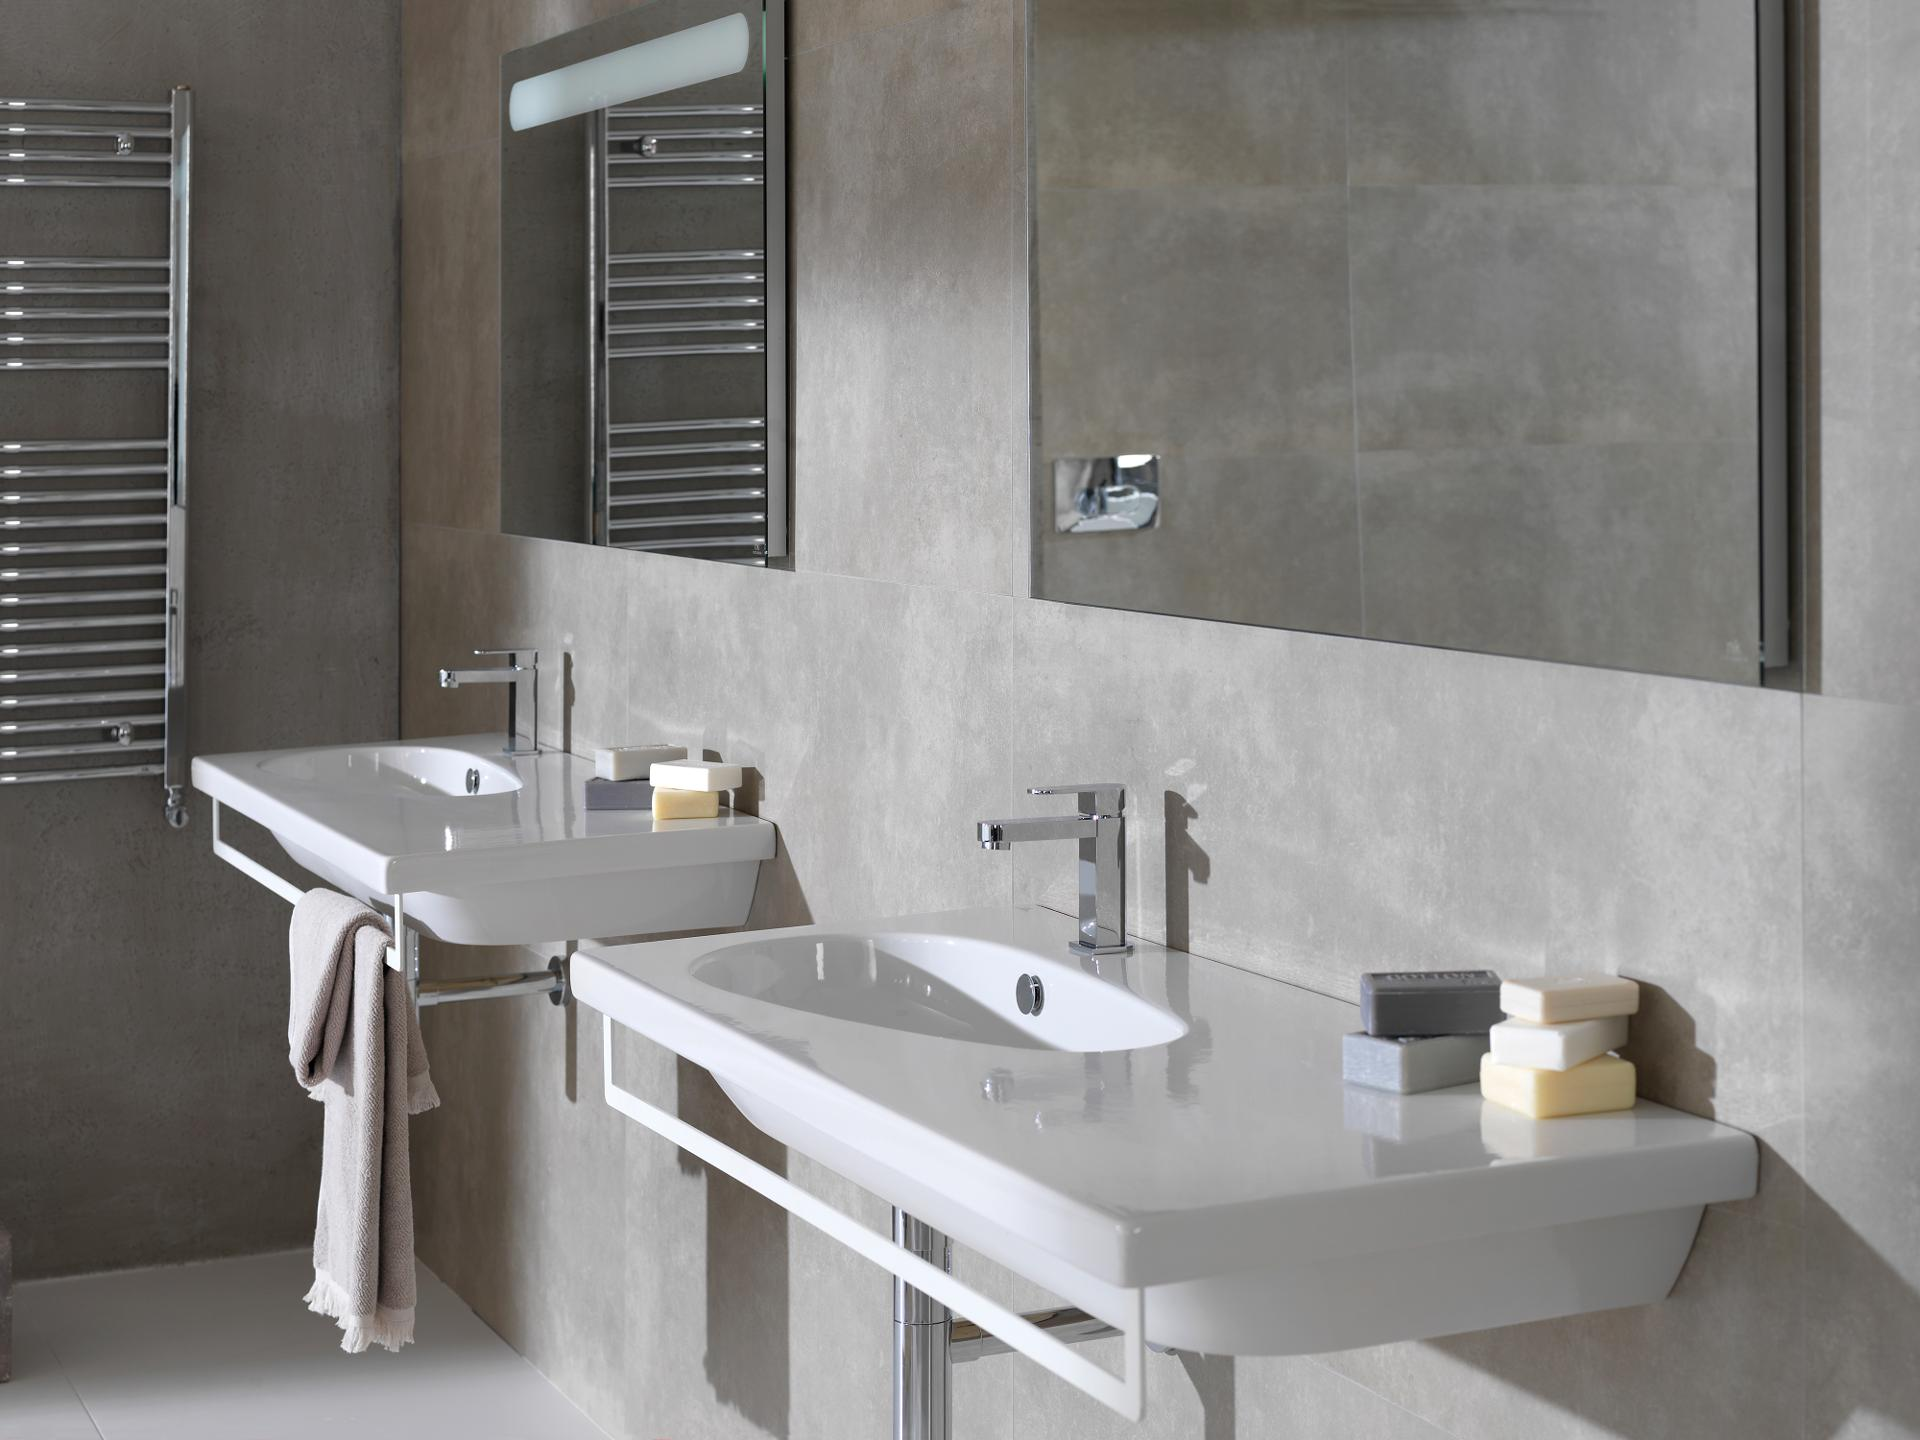 lavabo hotels 100126423 robinetterie salle de bain noken. Black Bedroom Furniture Sets. Home Design Ideas